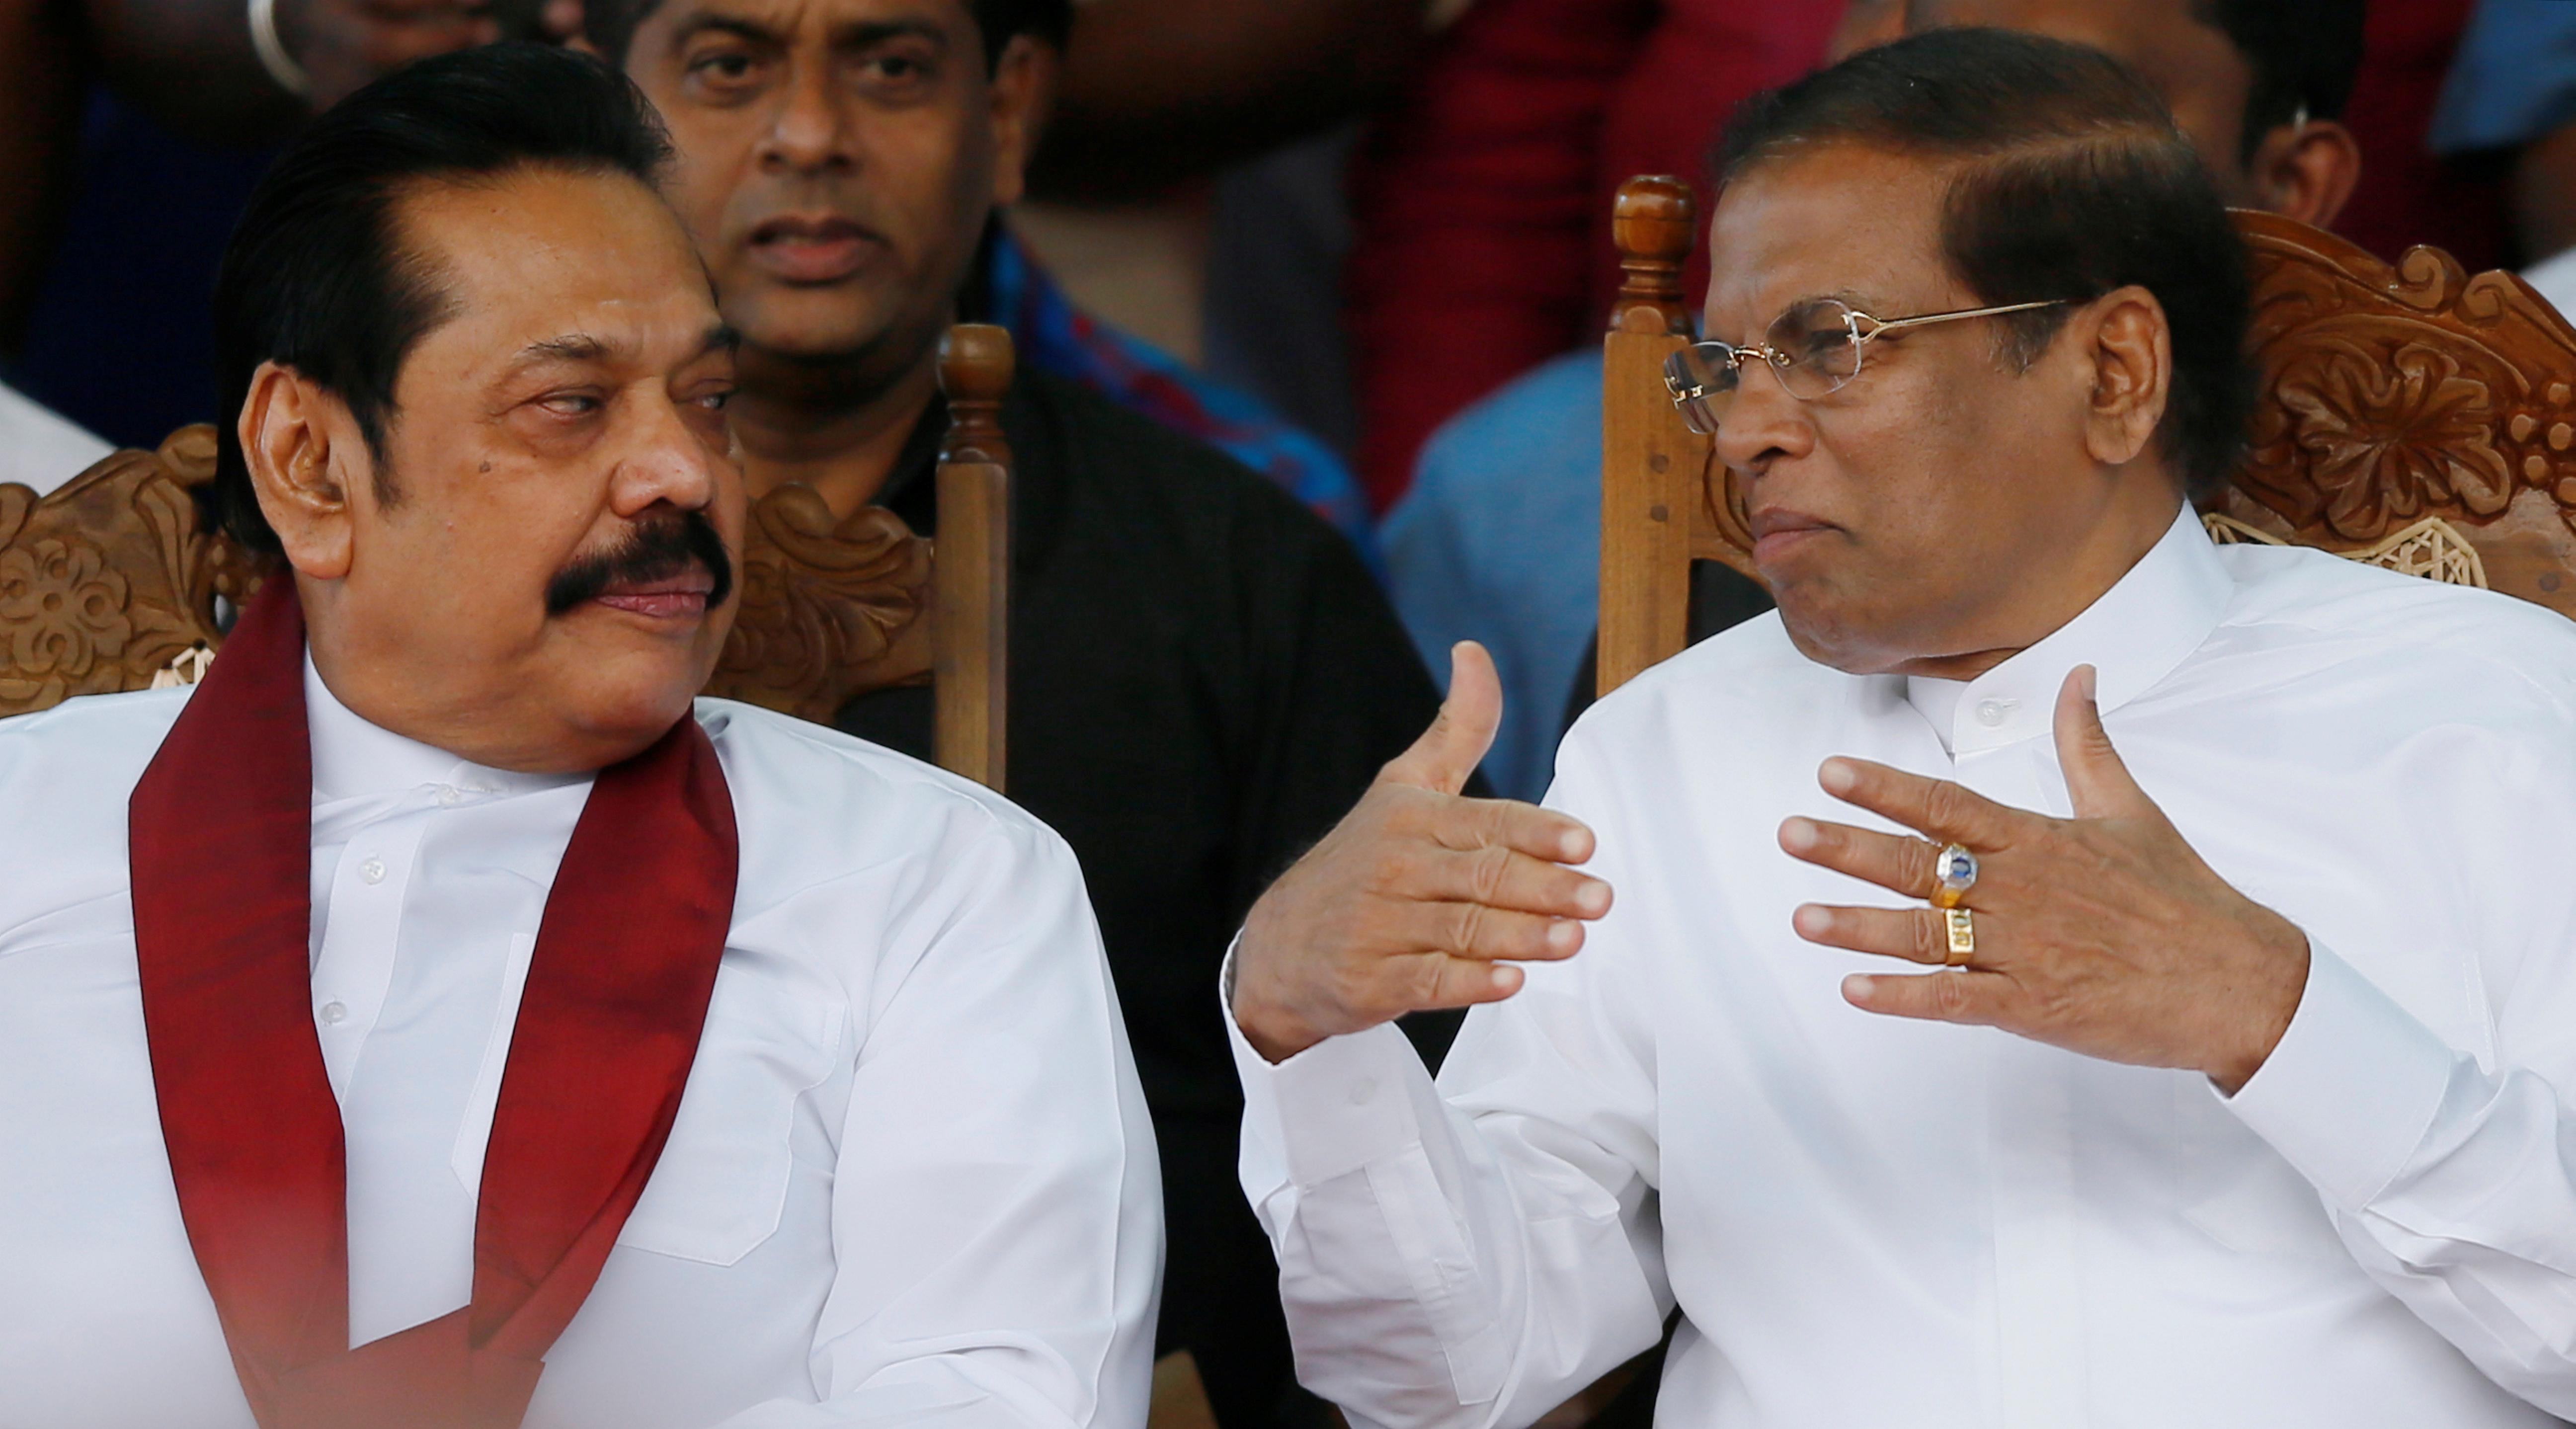 Sri Lanka's presidential elections: Progress, regression, or